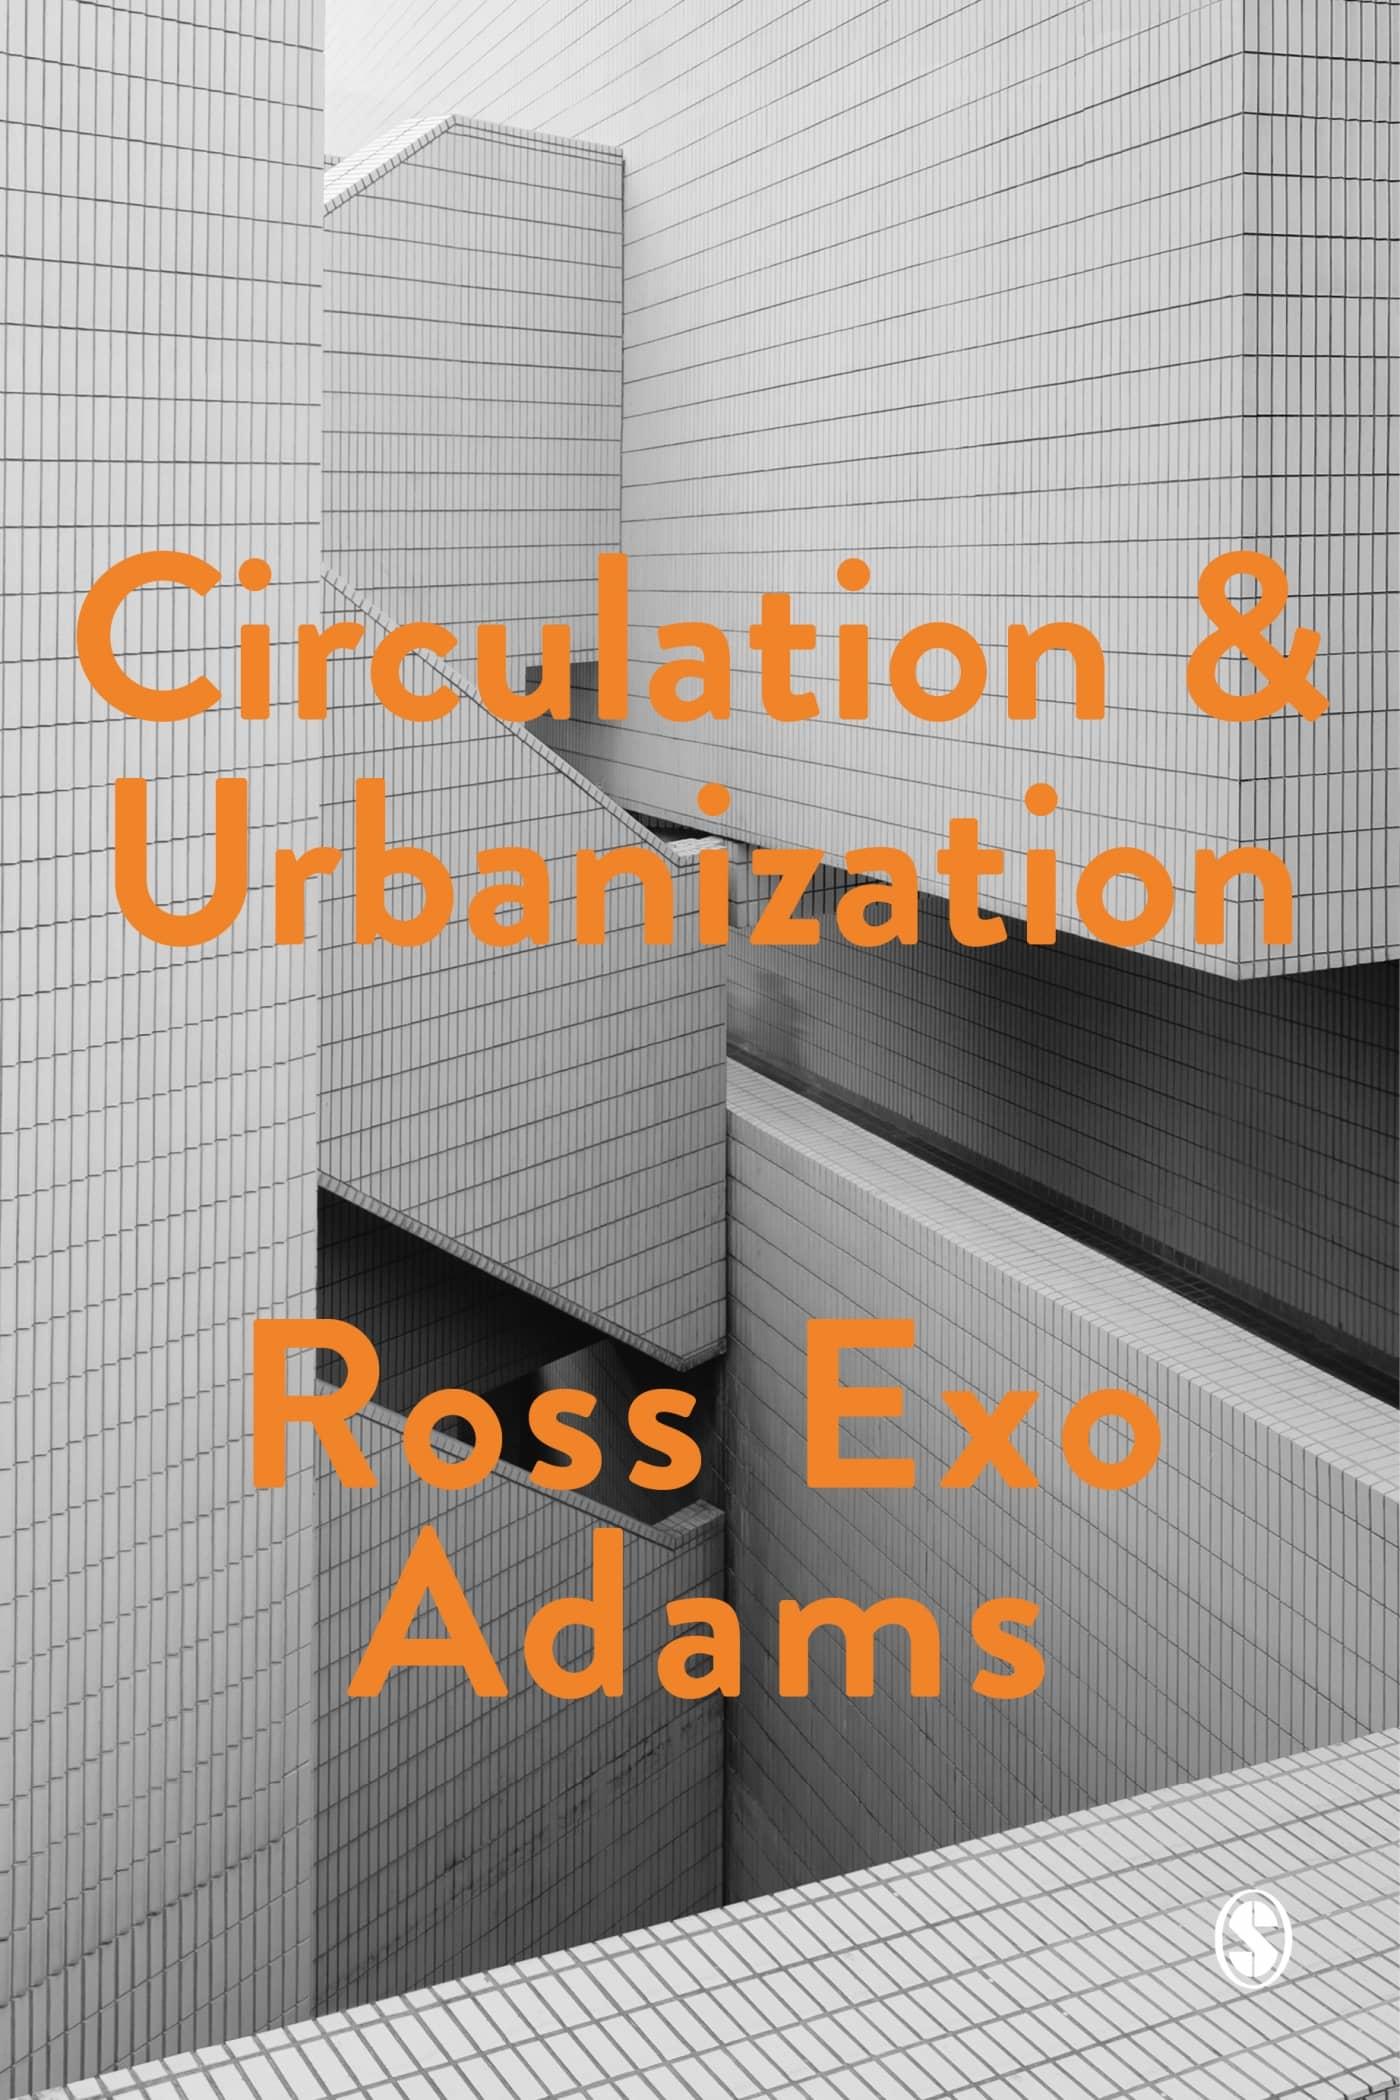 'Circulation & Urbanization' book cover